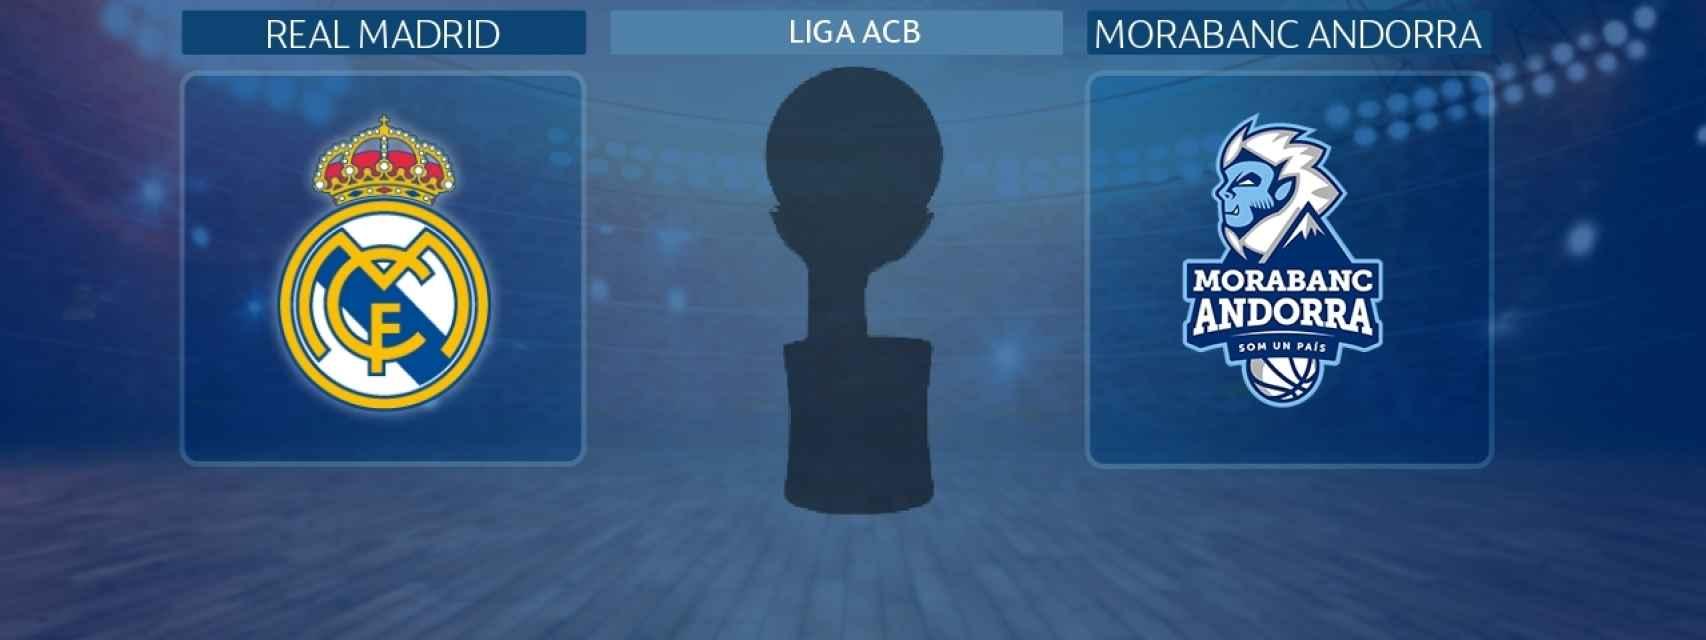 Real Madrid - MoraBanc Andorra